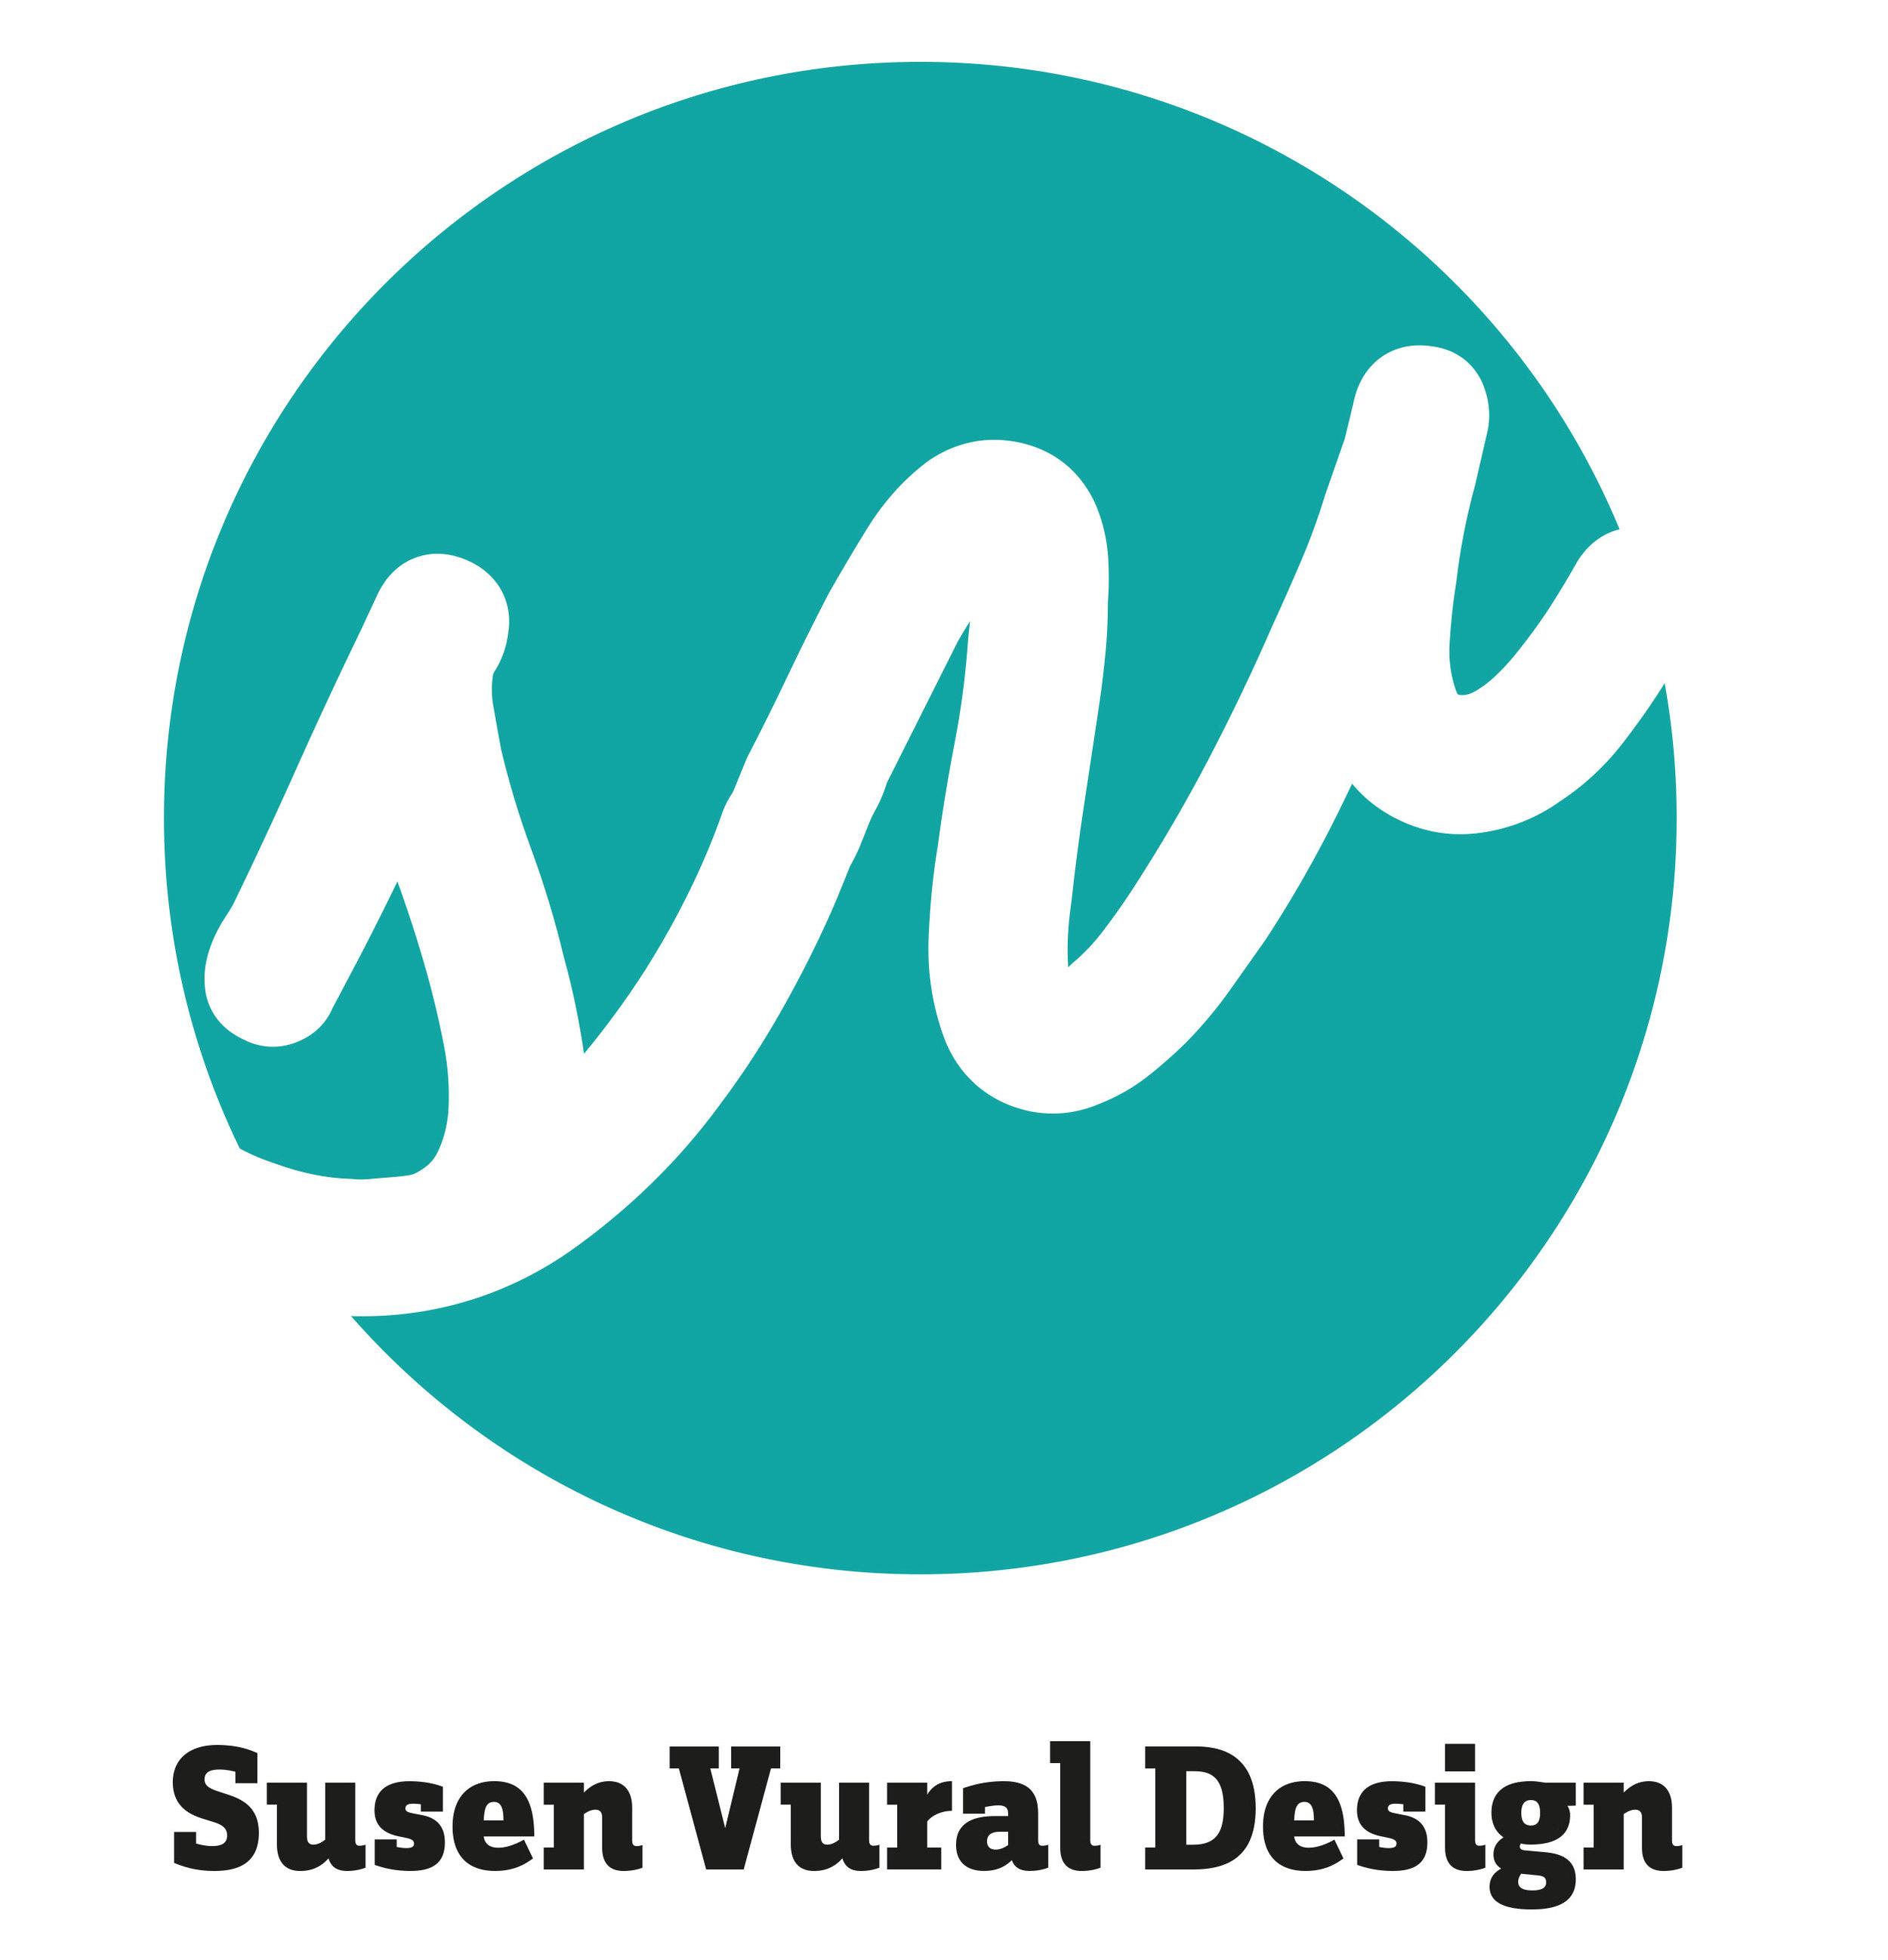 SV-logo_FINAL.jpg